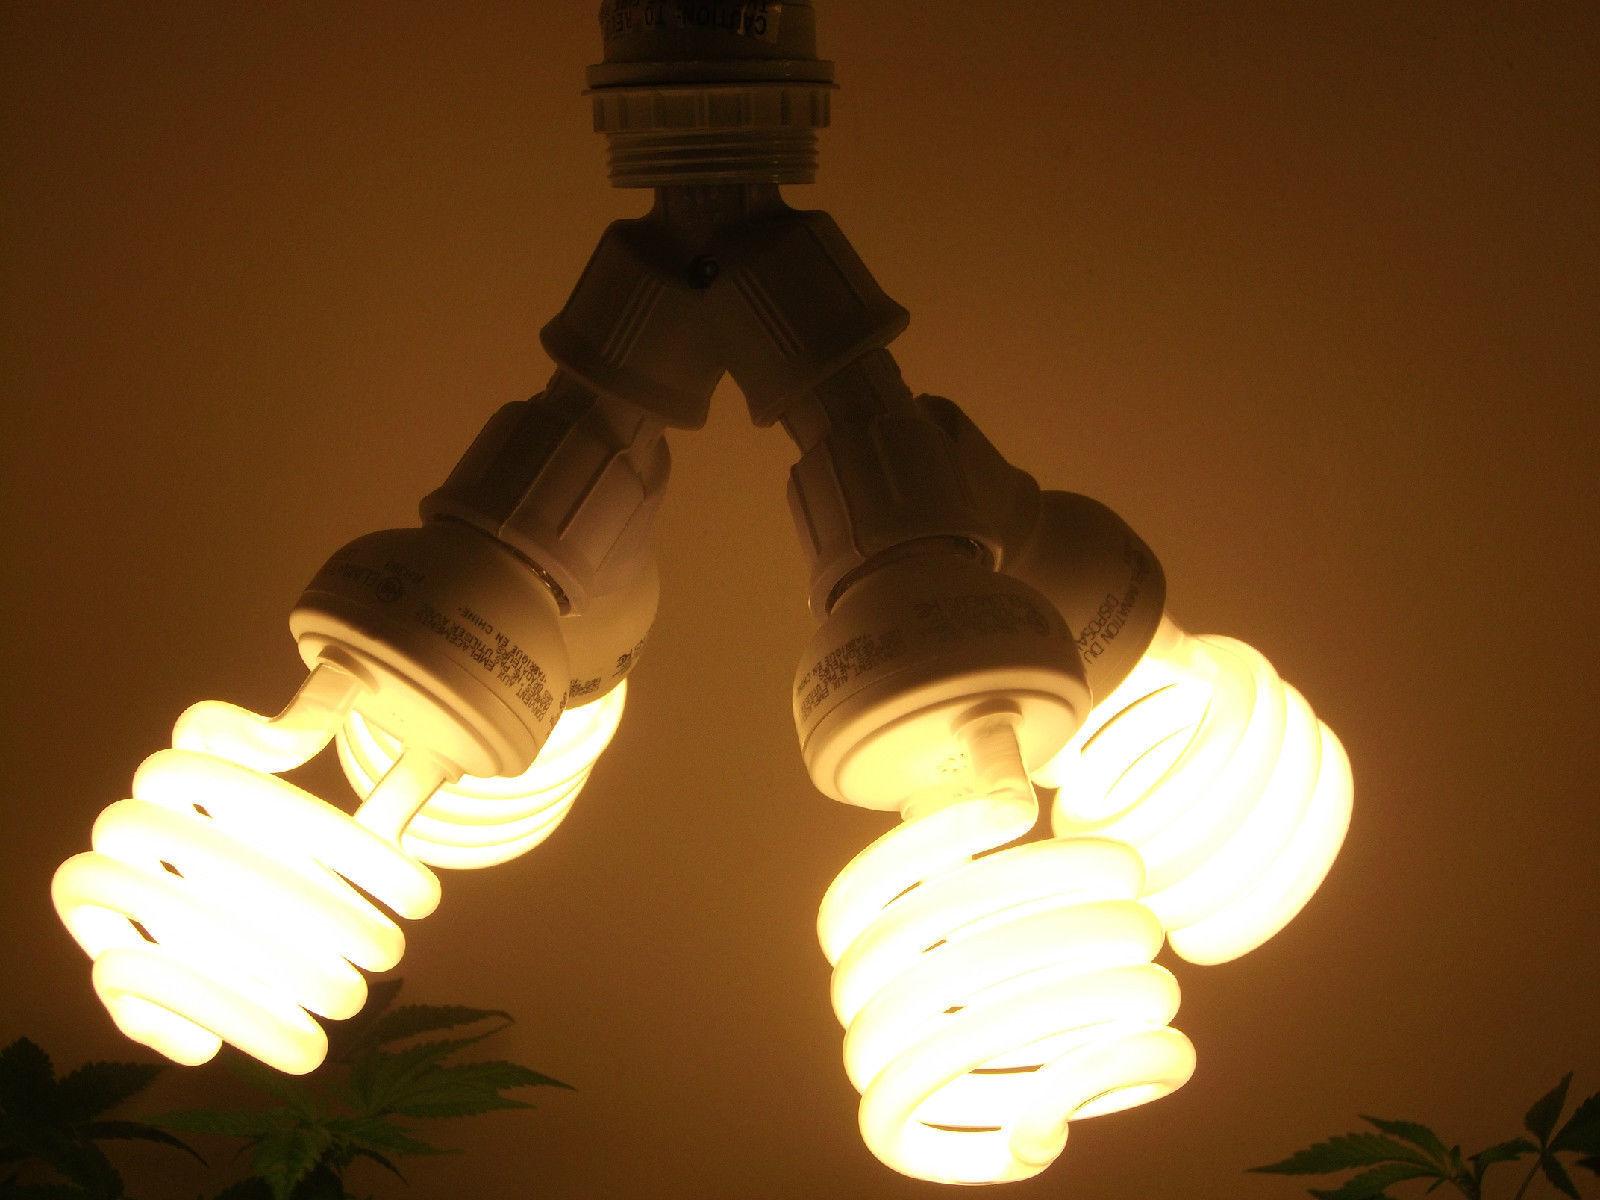 400 WATT CFL ENERGY SMART GROW LIGHT KIT/ SET- FOR VEG AND CLONES- NO CORD